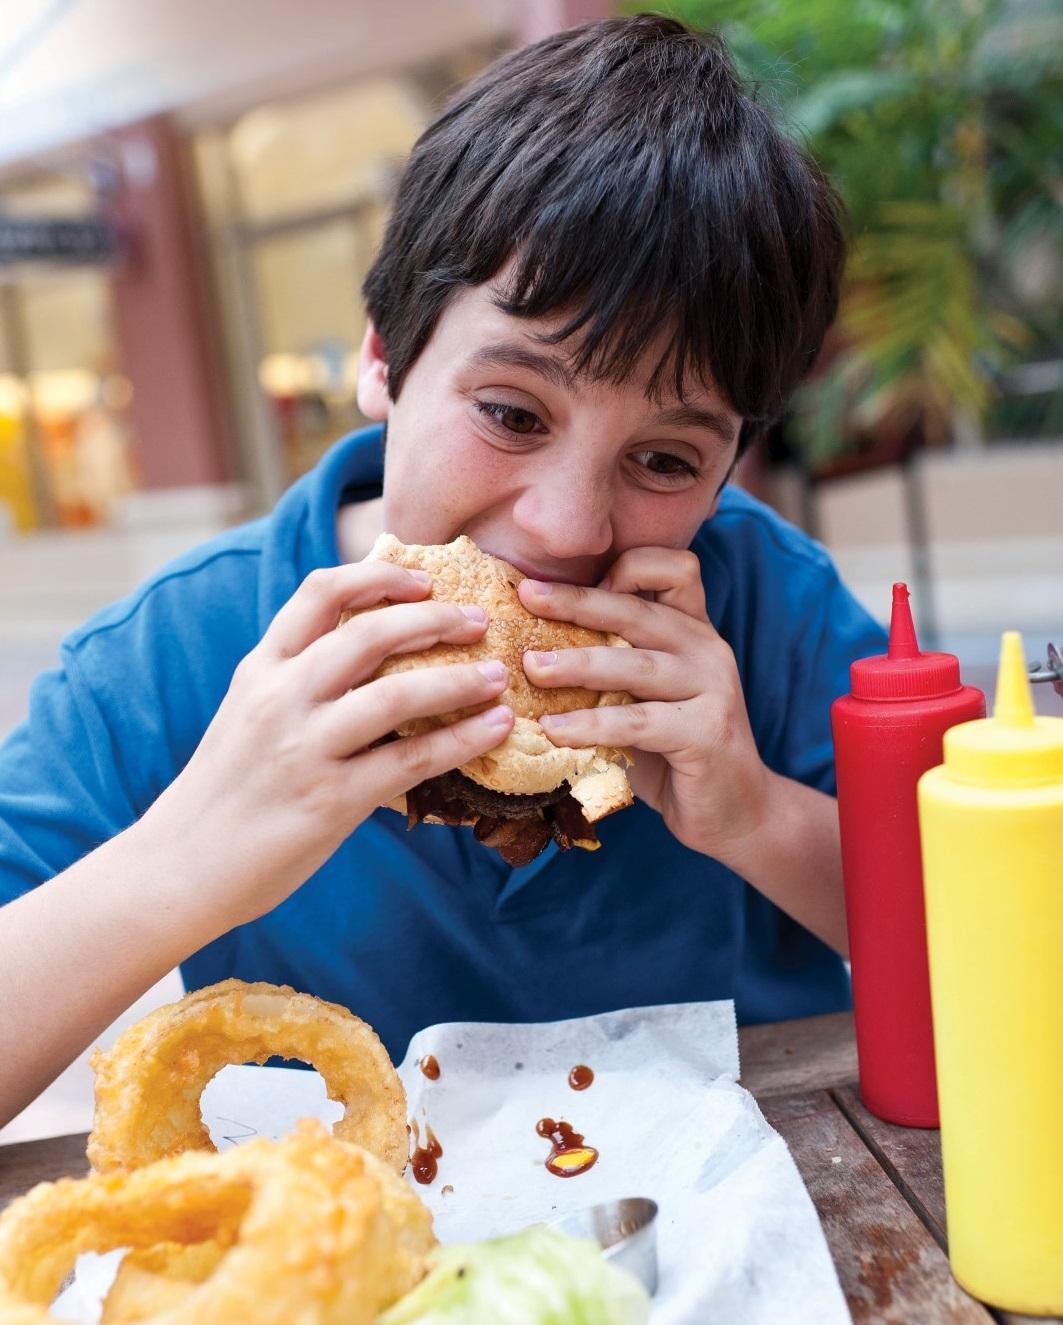 Teenage Sins: Gluttony